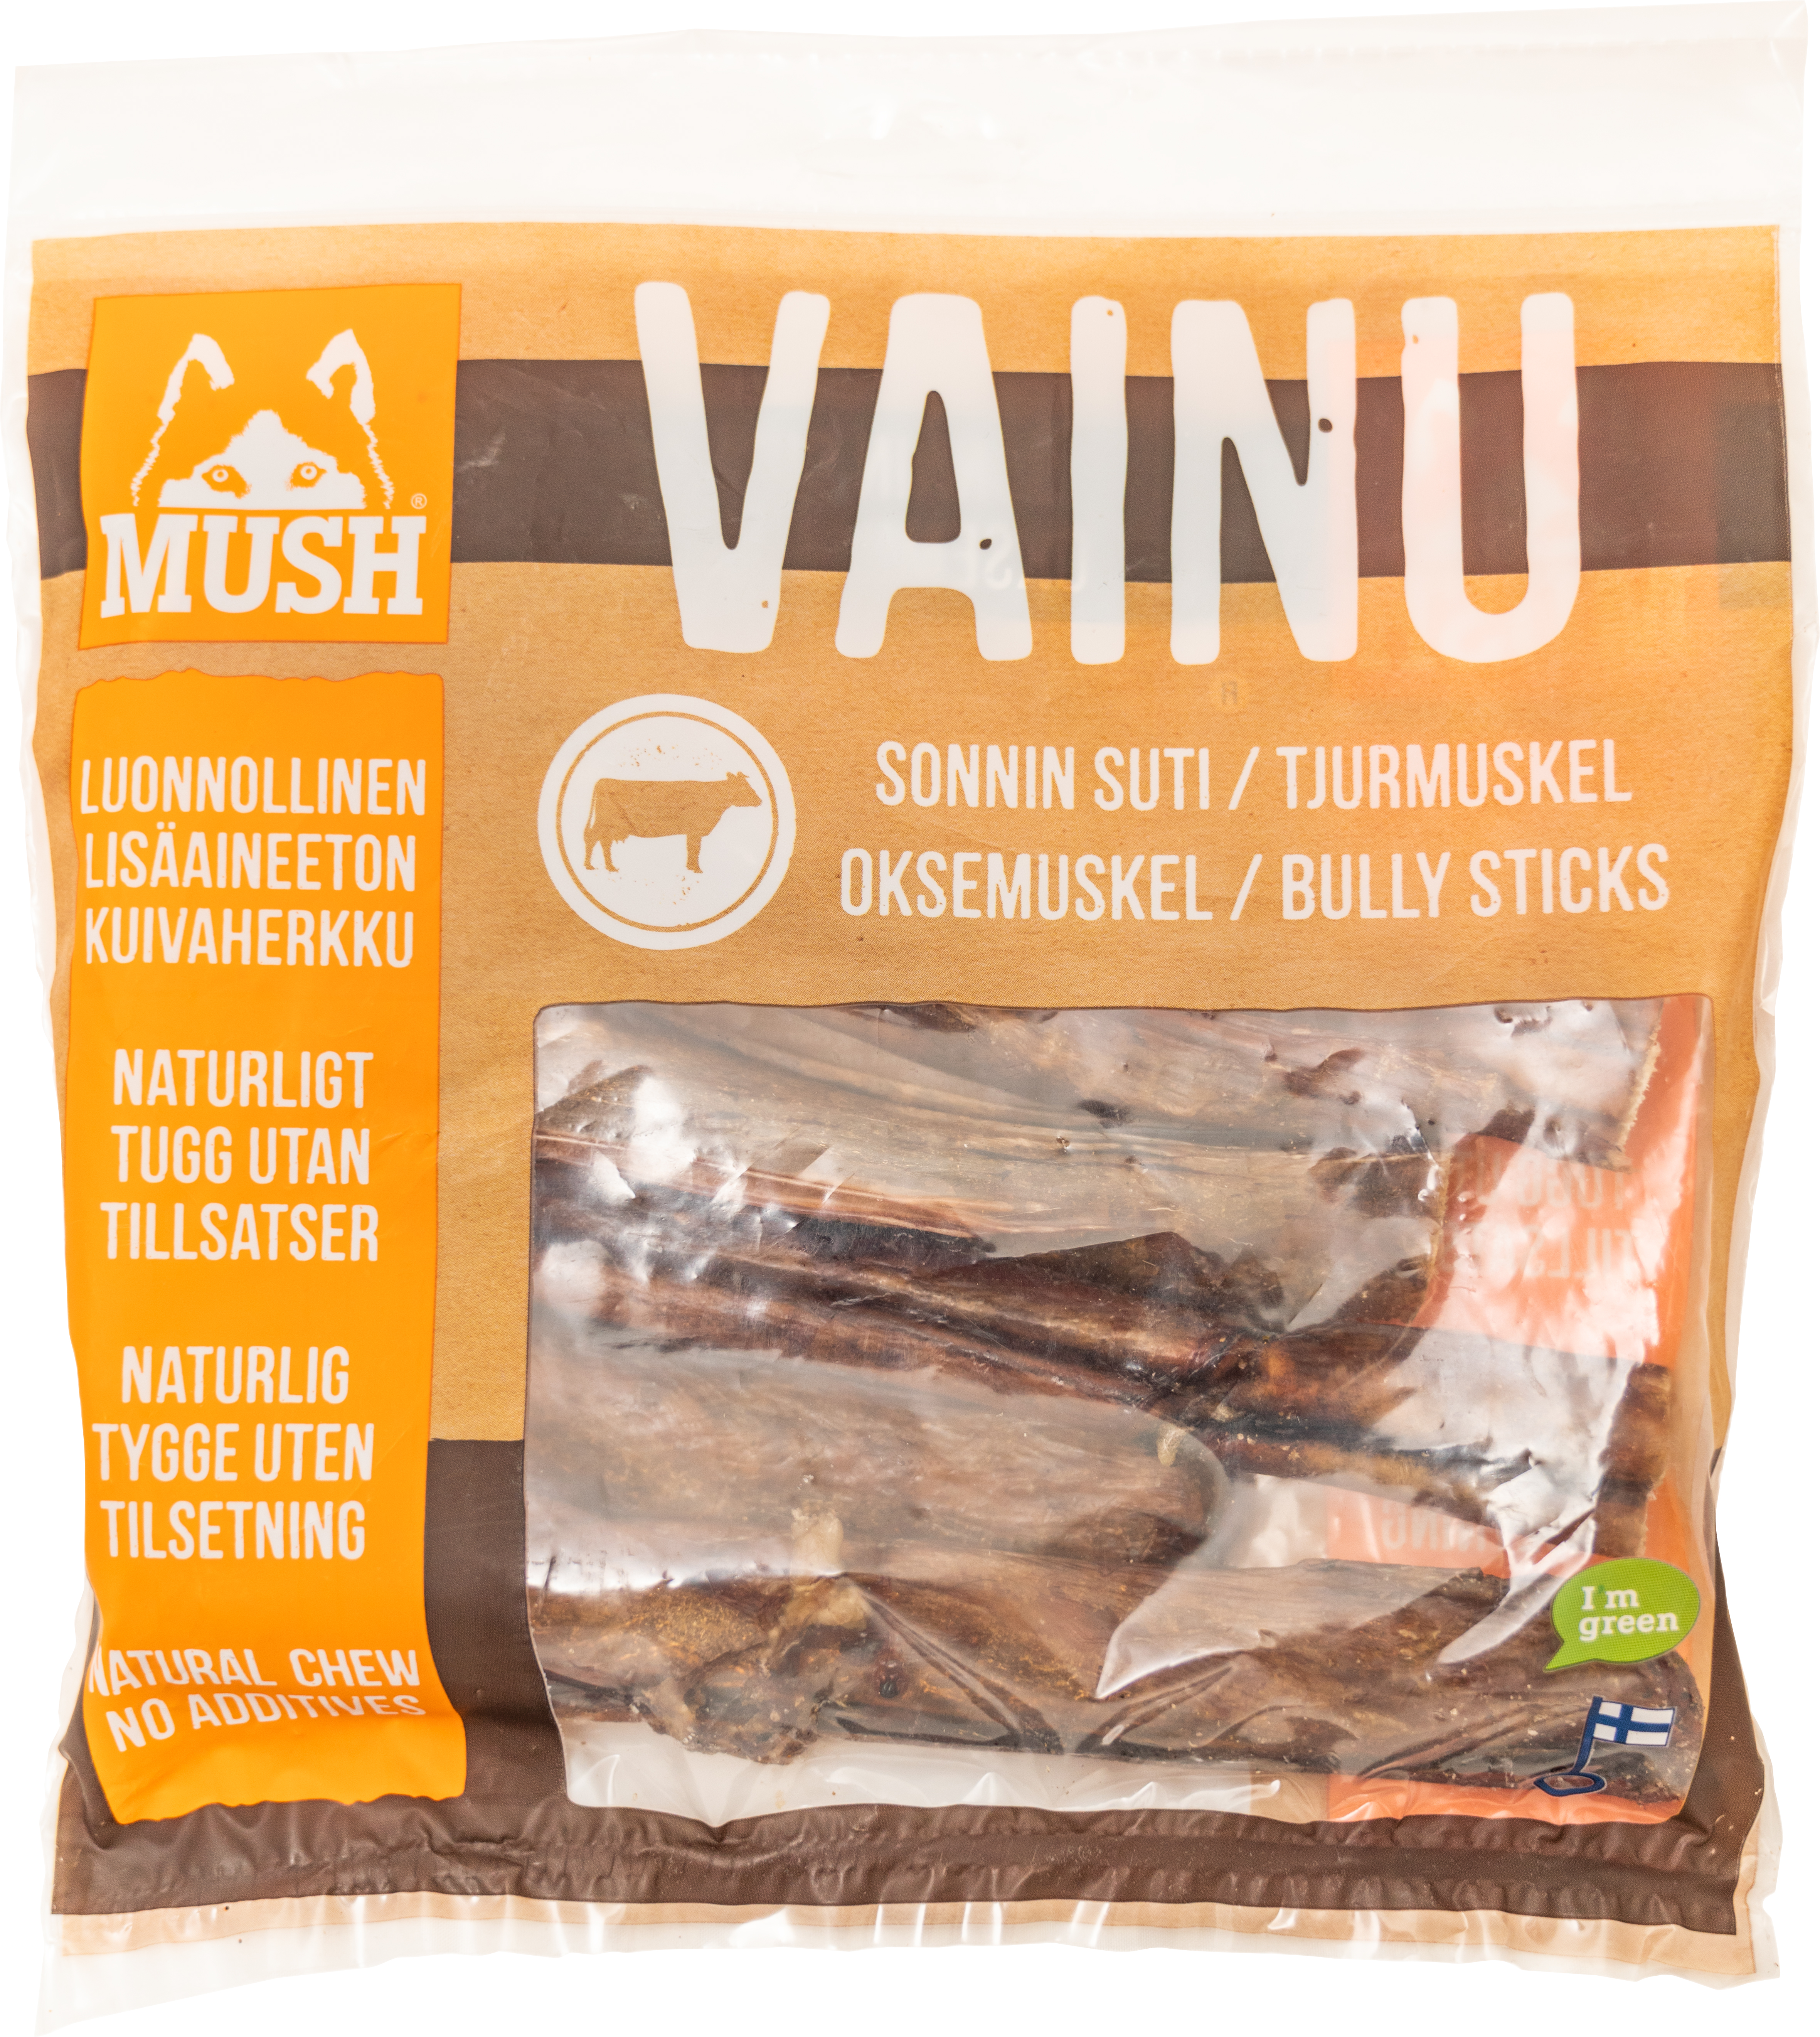 Hundtugg Mush Vainu Tjurmuskel, 250 g